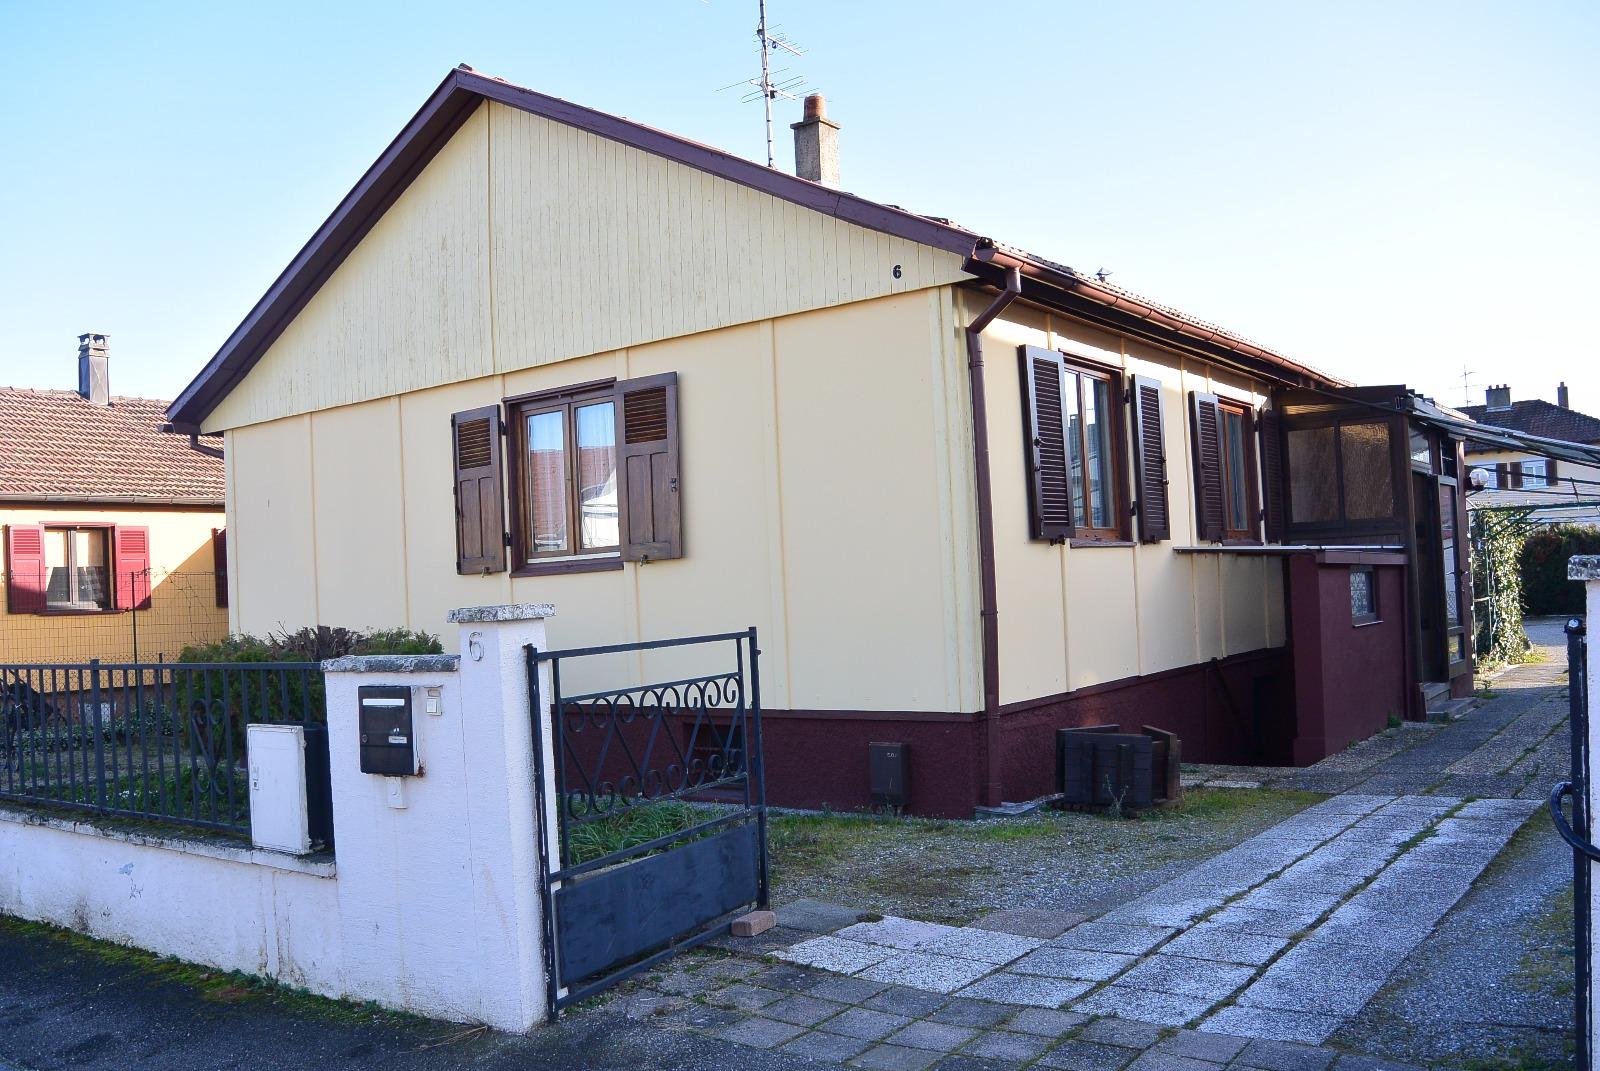 Vente maison individuelle wittenheim 68270 65m avec 3 for Achat maison individuelle wittenheim